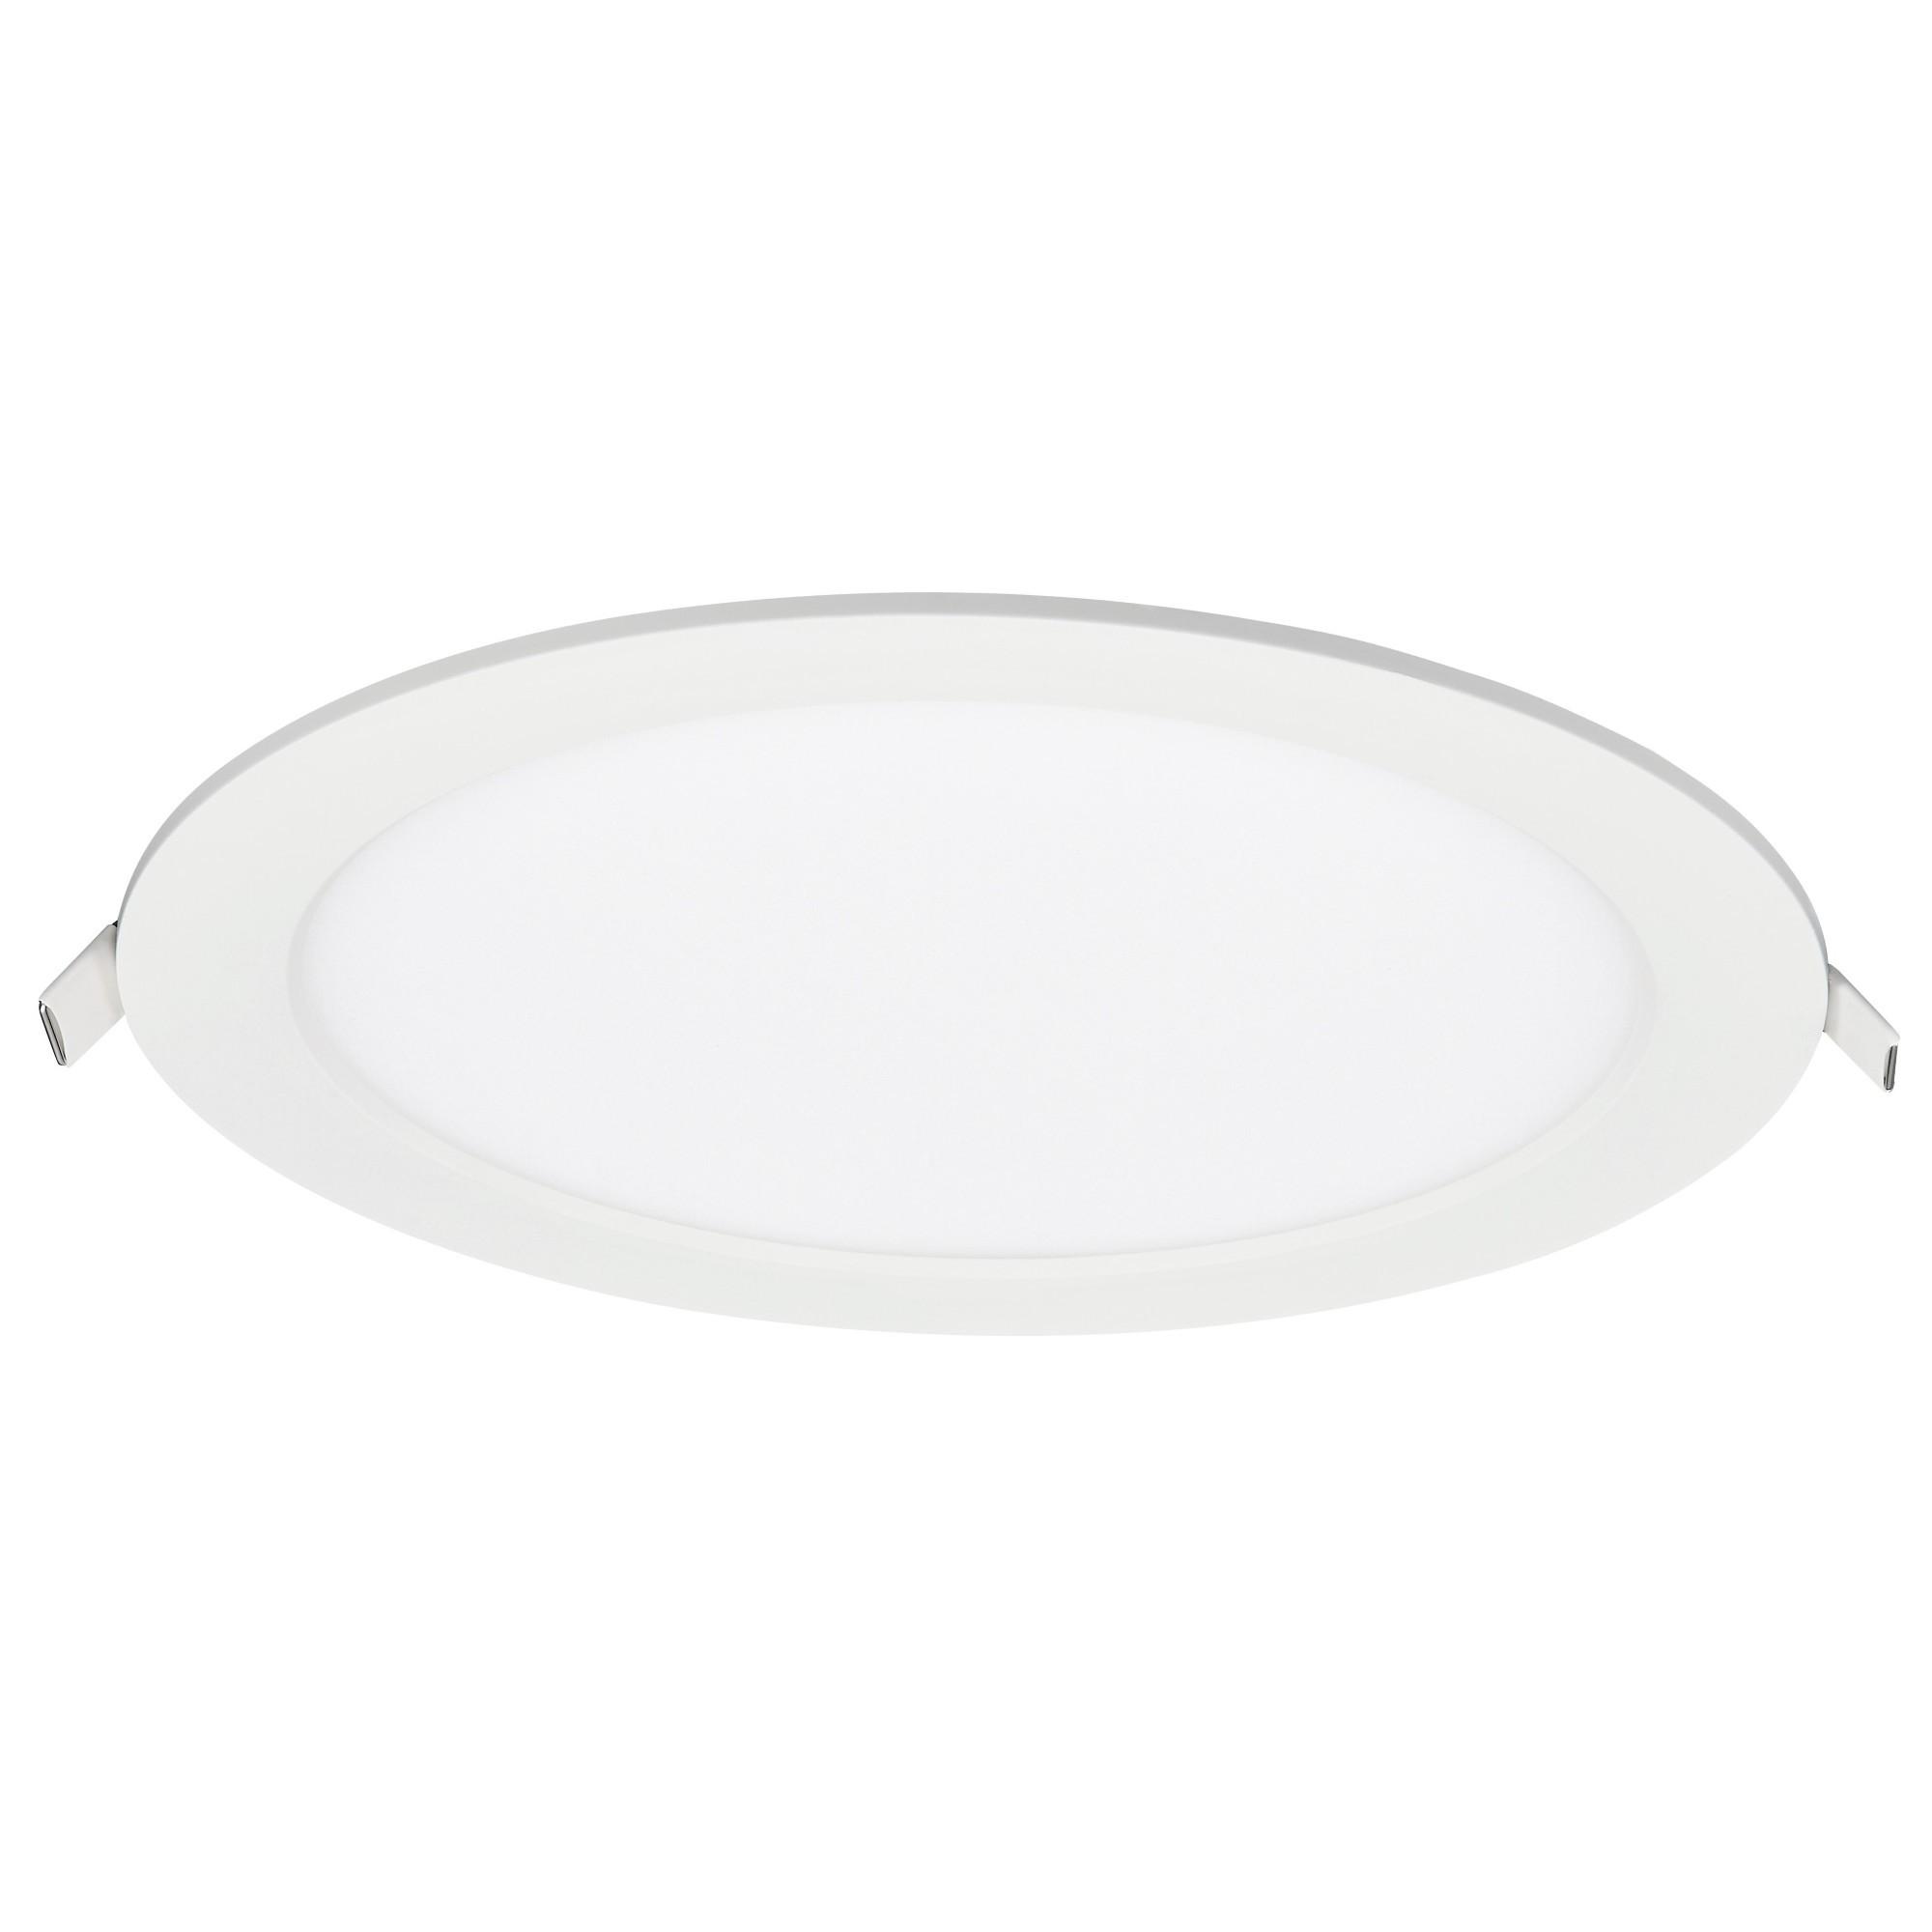 Painel LED Redondo de Embutir em Aluminio Luz Amarela 24W Bivolt - Ecoline